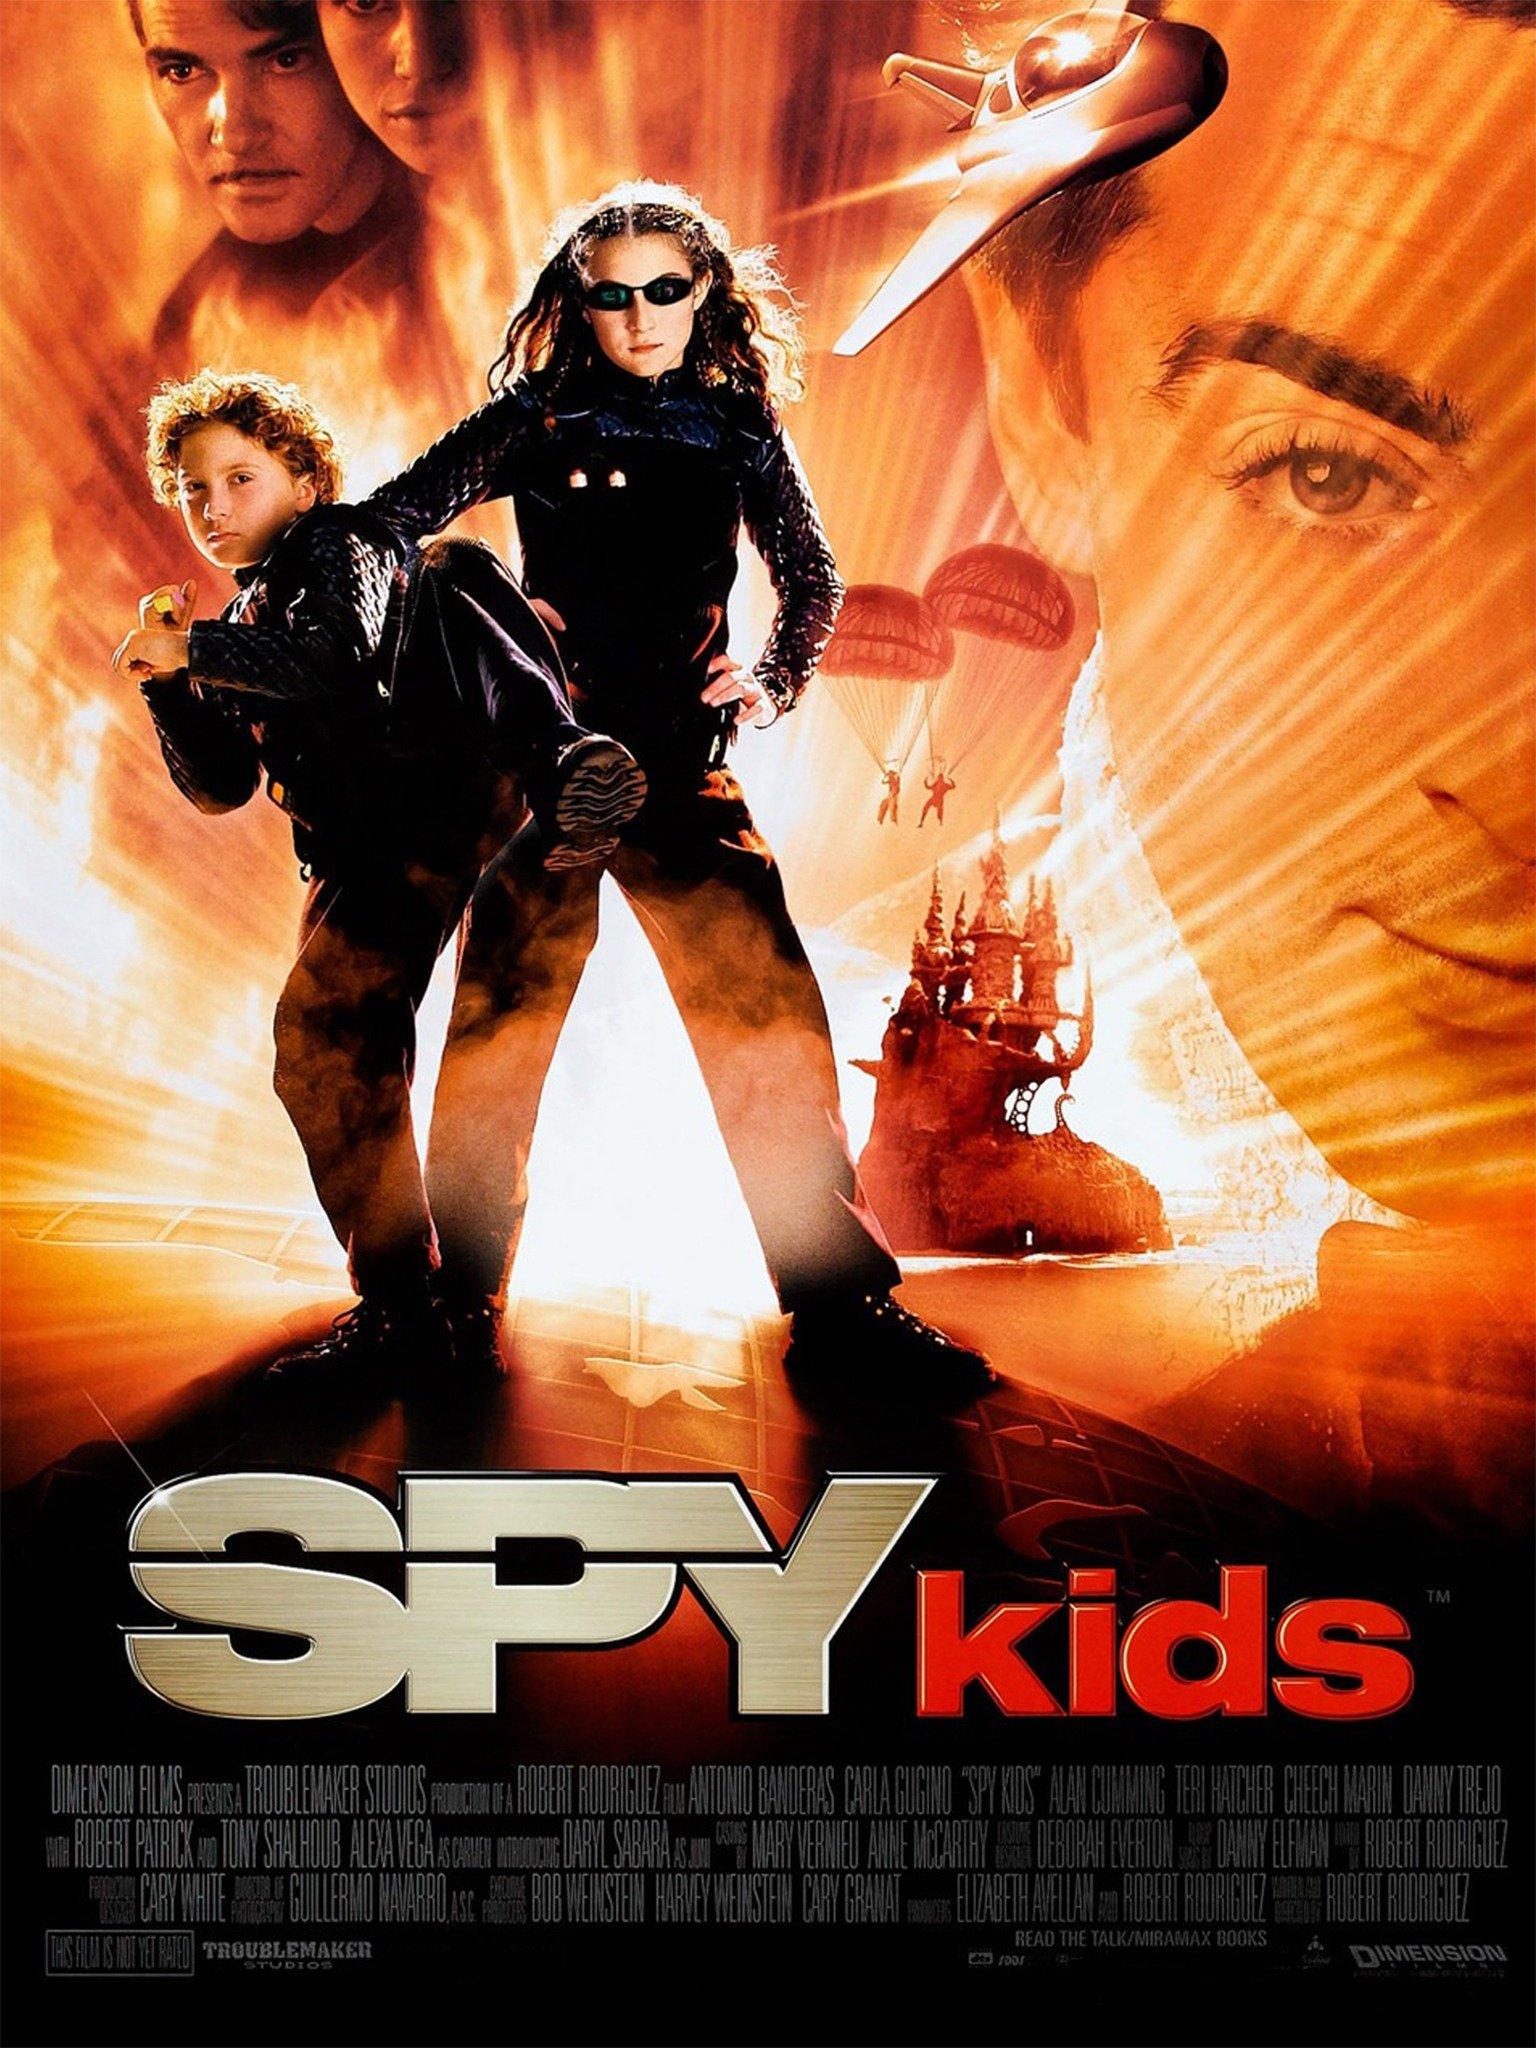 Spy Kids (2001) - Rotten Tomatoes